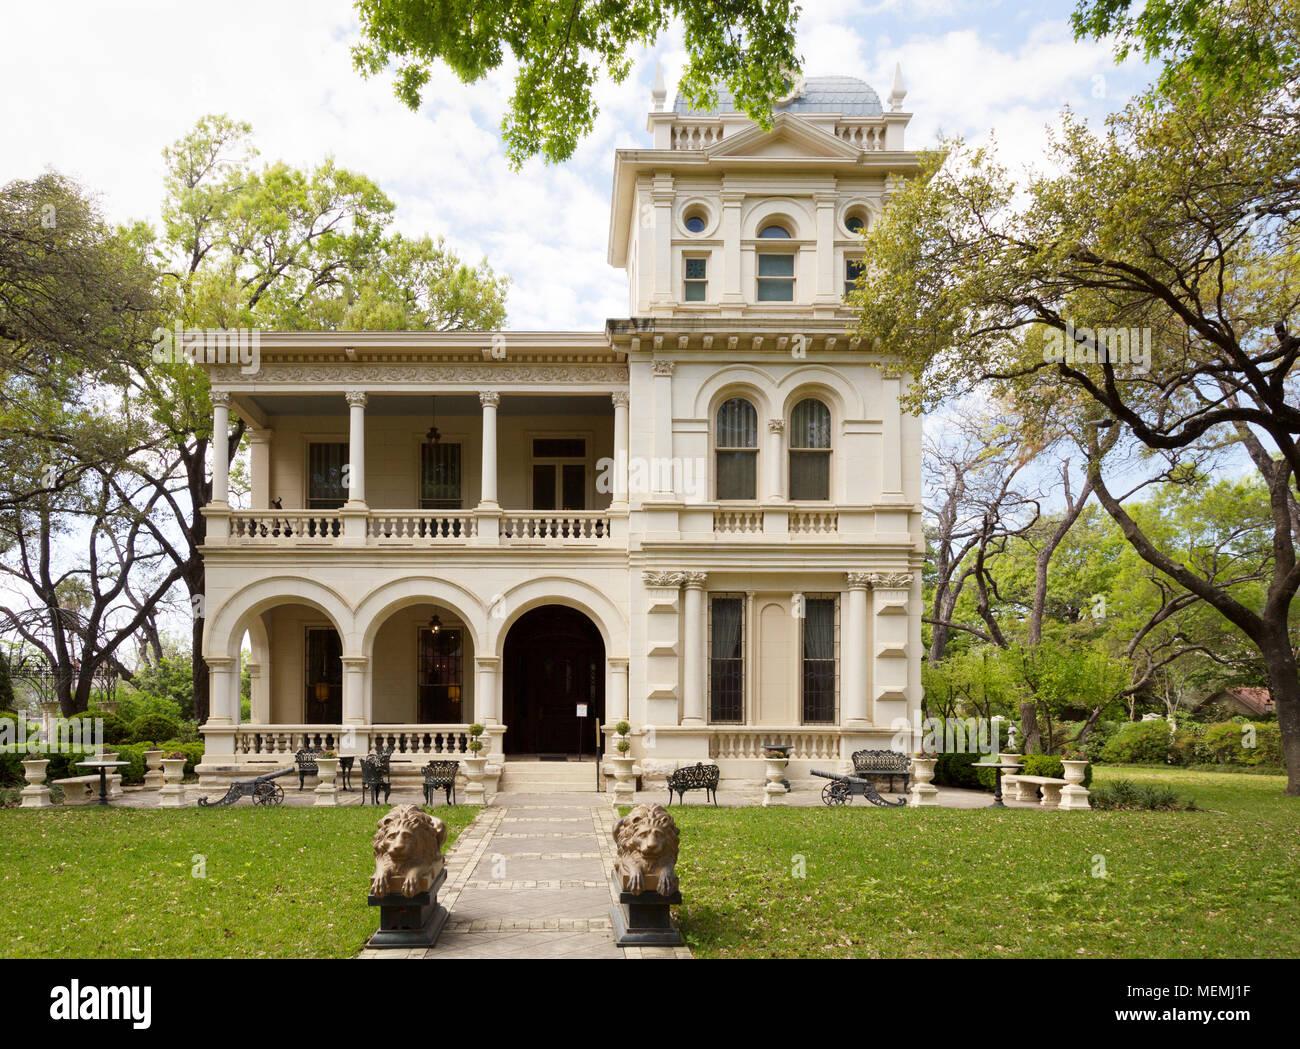 Villa Finale Museum, exterior, in the upmarket King William district, San Antonio Texas, USA - Stock Image